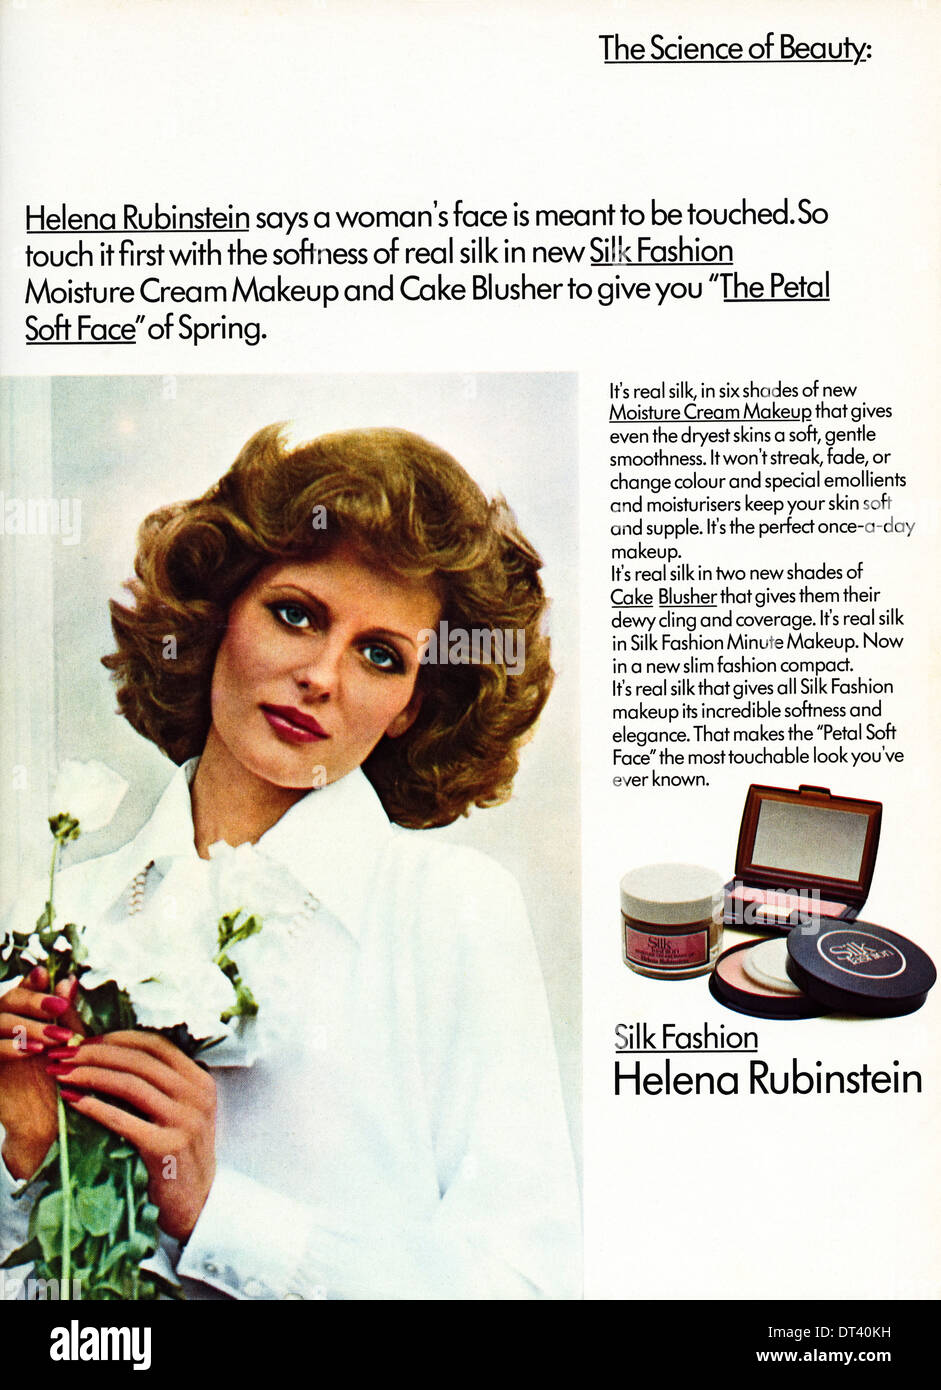 1970s fashion magazine advertisement advertising make up by HELENA RUBINSTEIN, advert circa 1975 - Stock Image